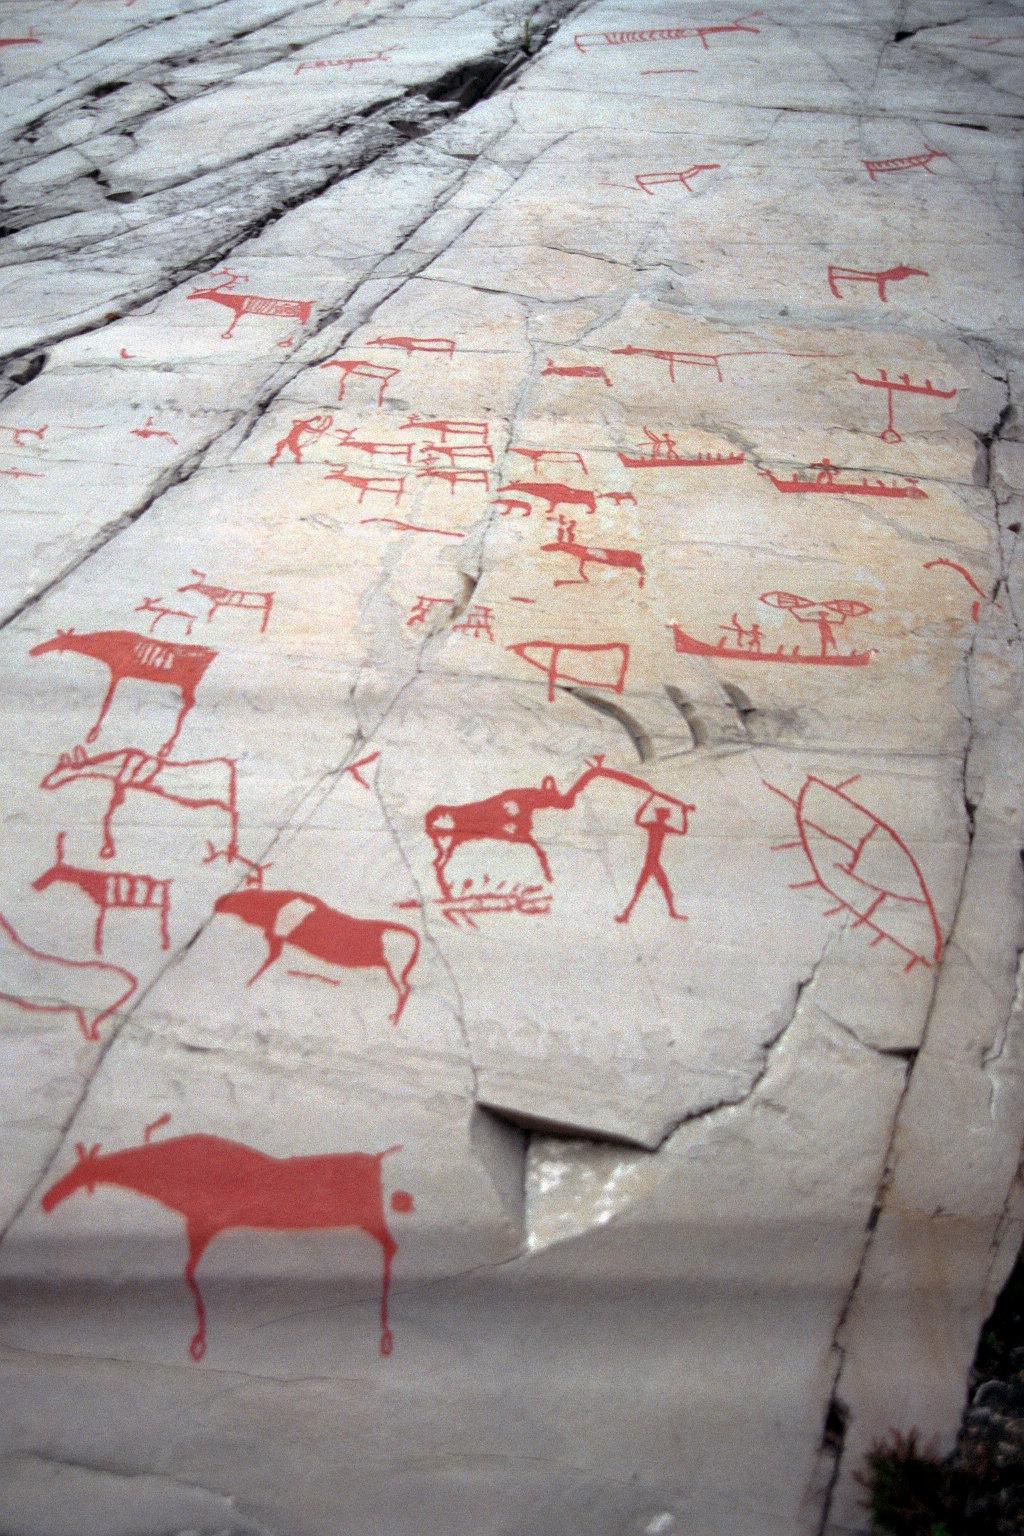 Rock carvings at alta wikidata